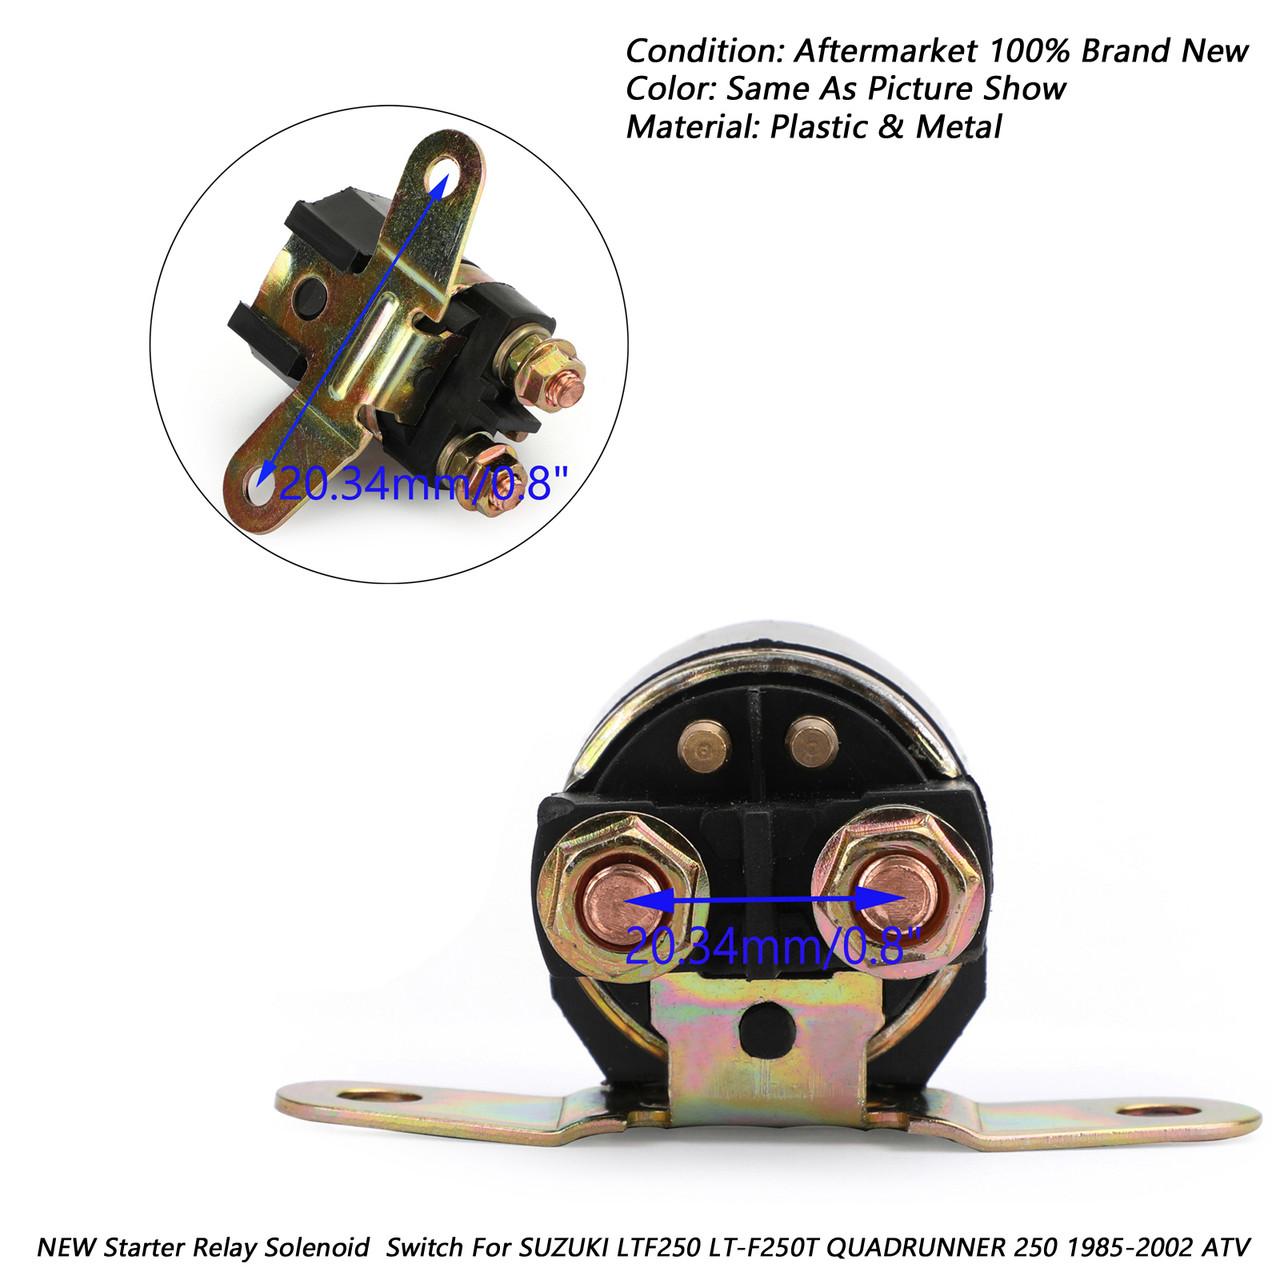 Starter Relay Solenoid Ignition Switch Key For SUZUKI LTF250